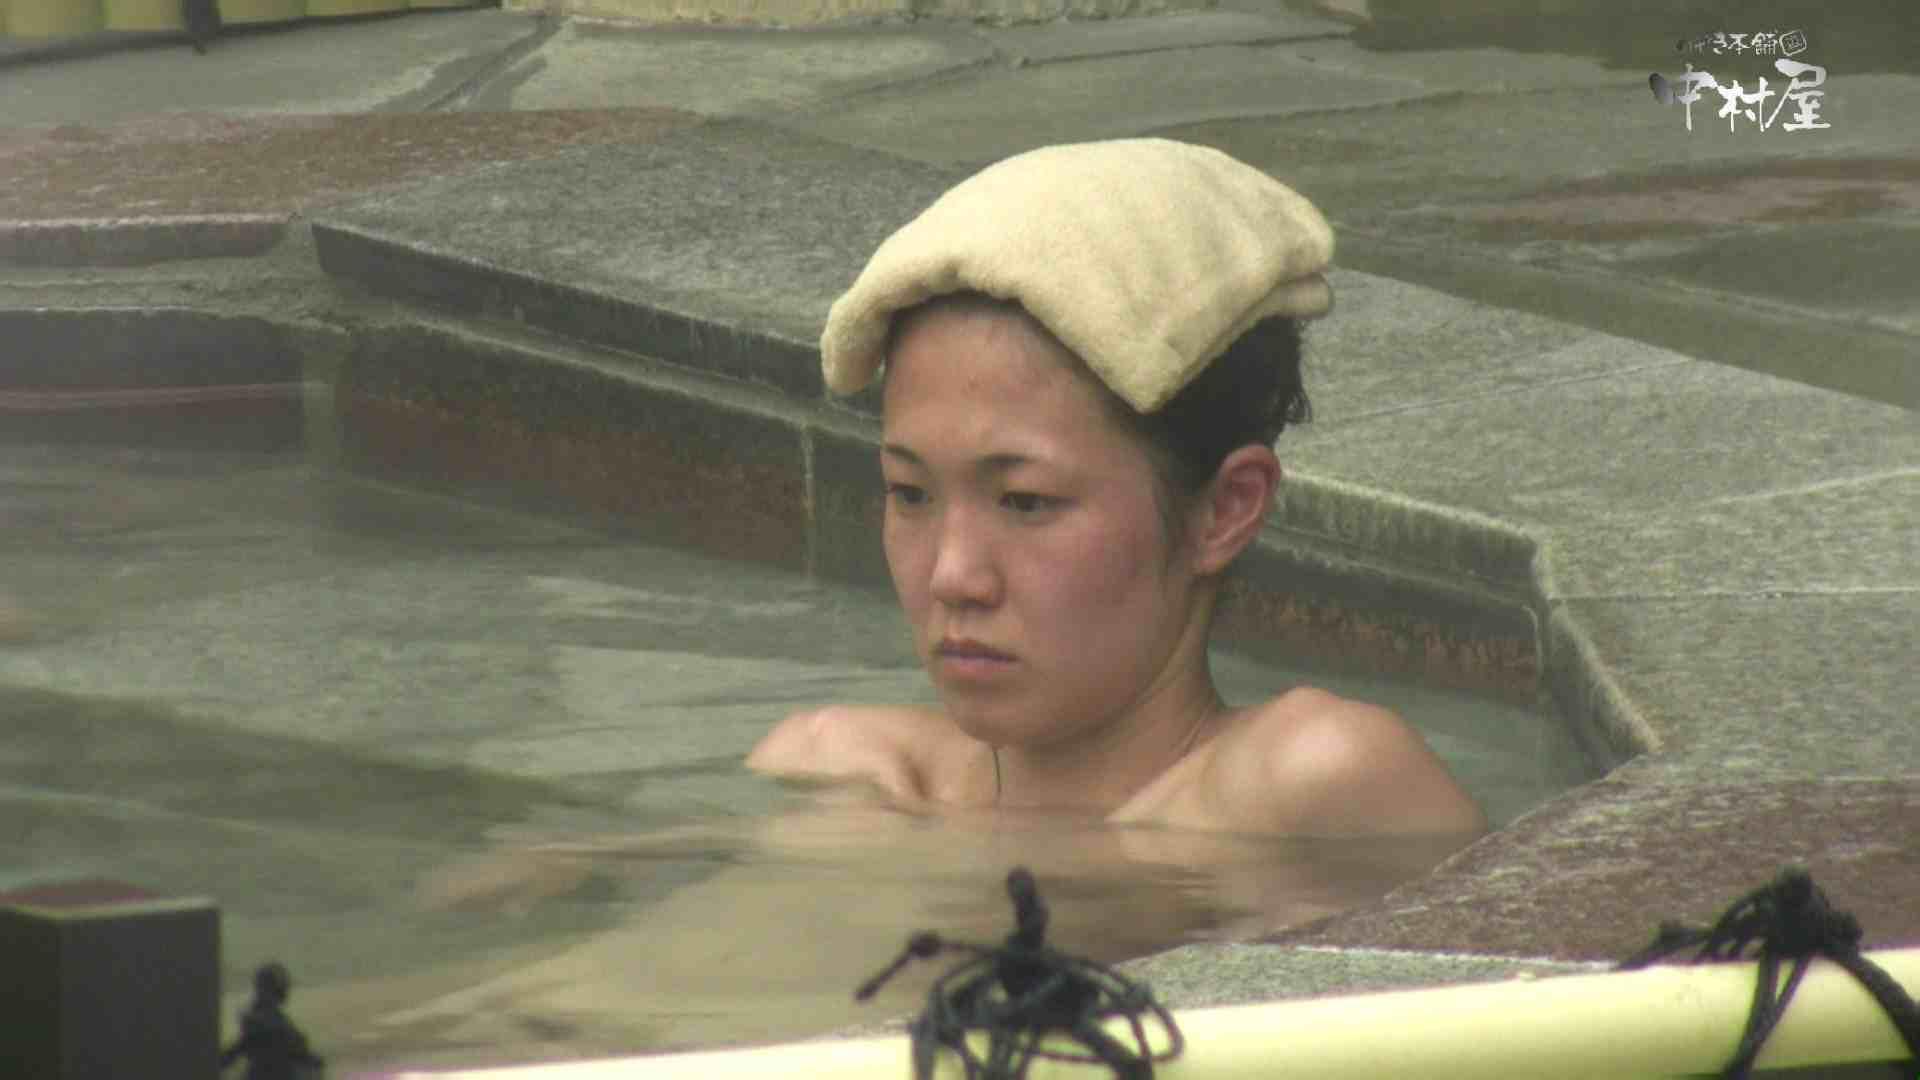 Aquaな露天風呂Vol.889 0   0  87連発 15